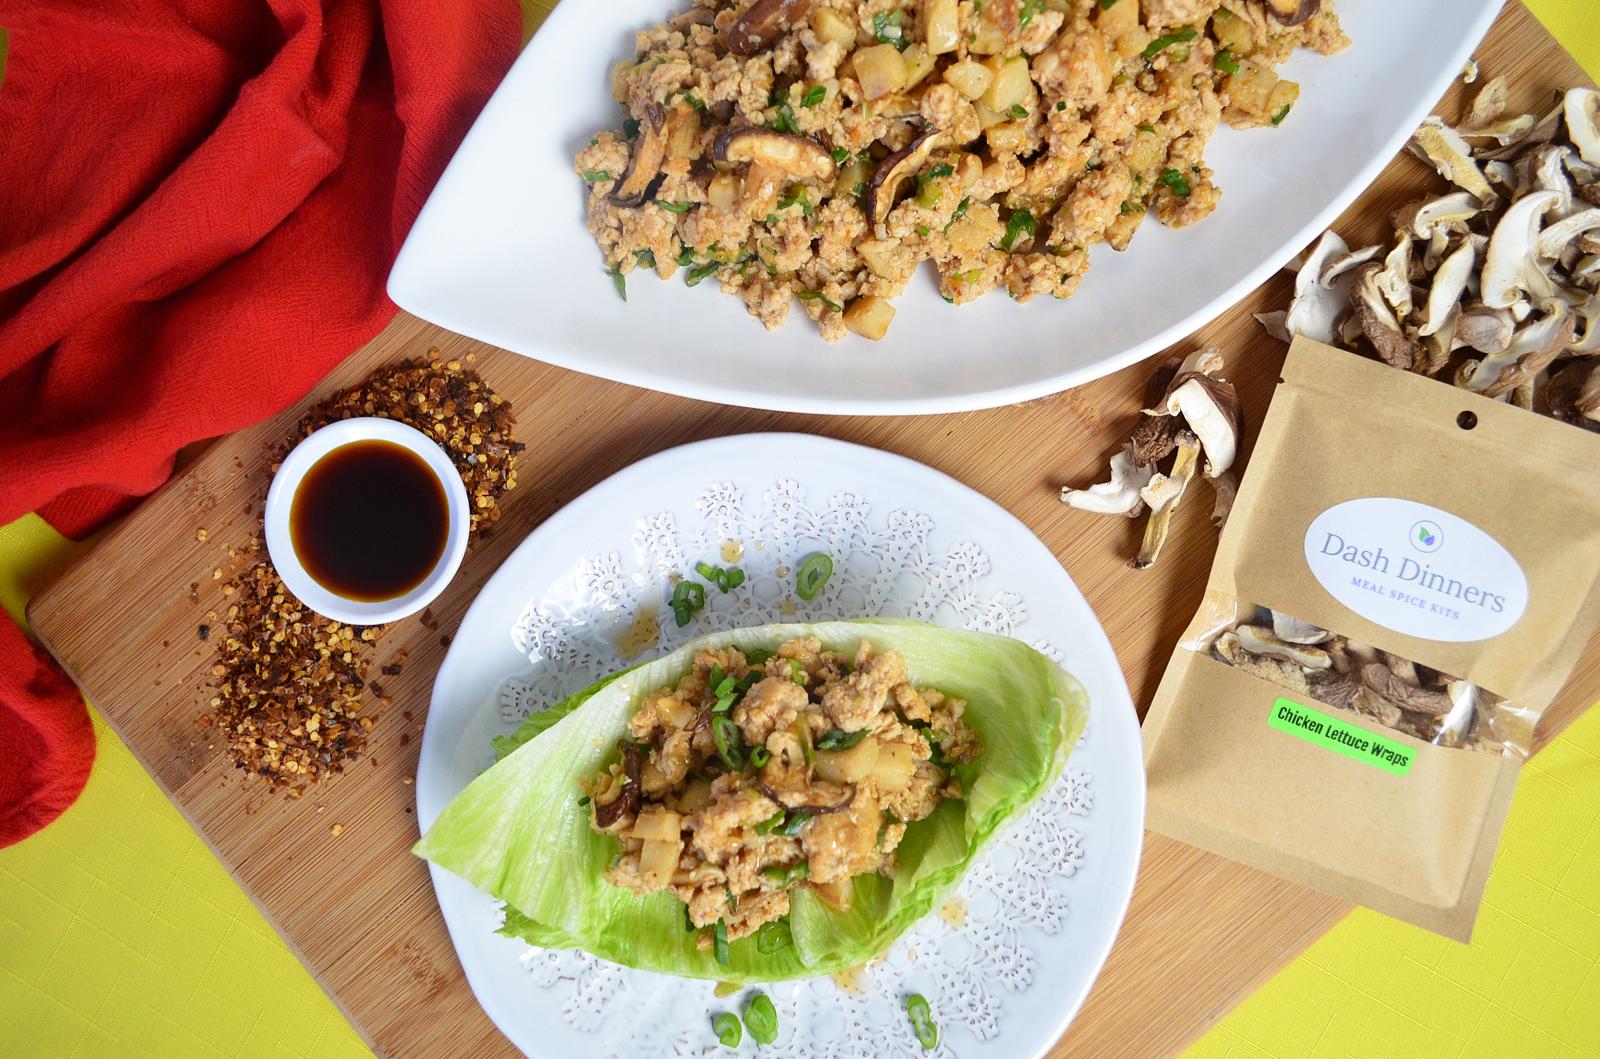 chinese-chicken-lettuce-wrap-spice-kit-18-oz-for-1pan-dinner